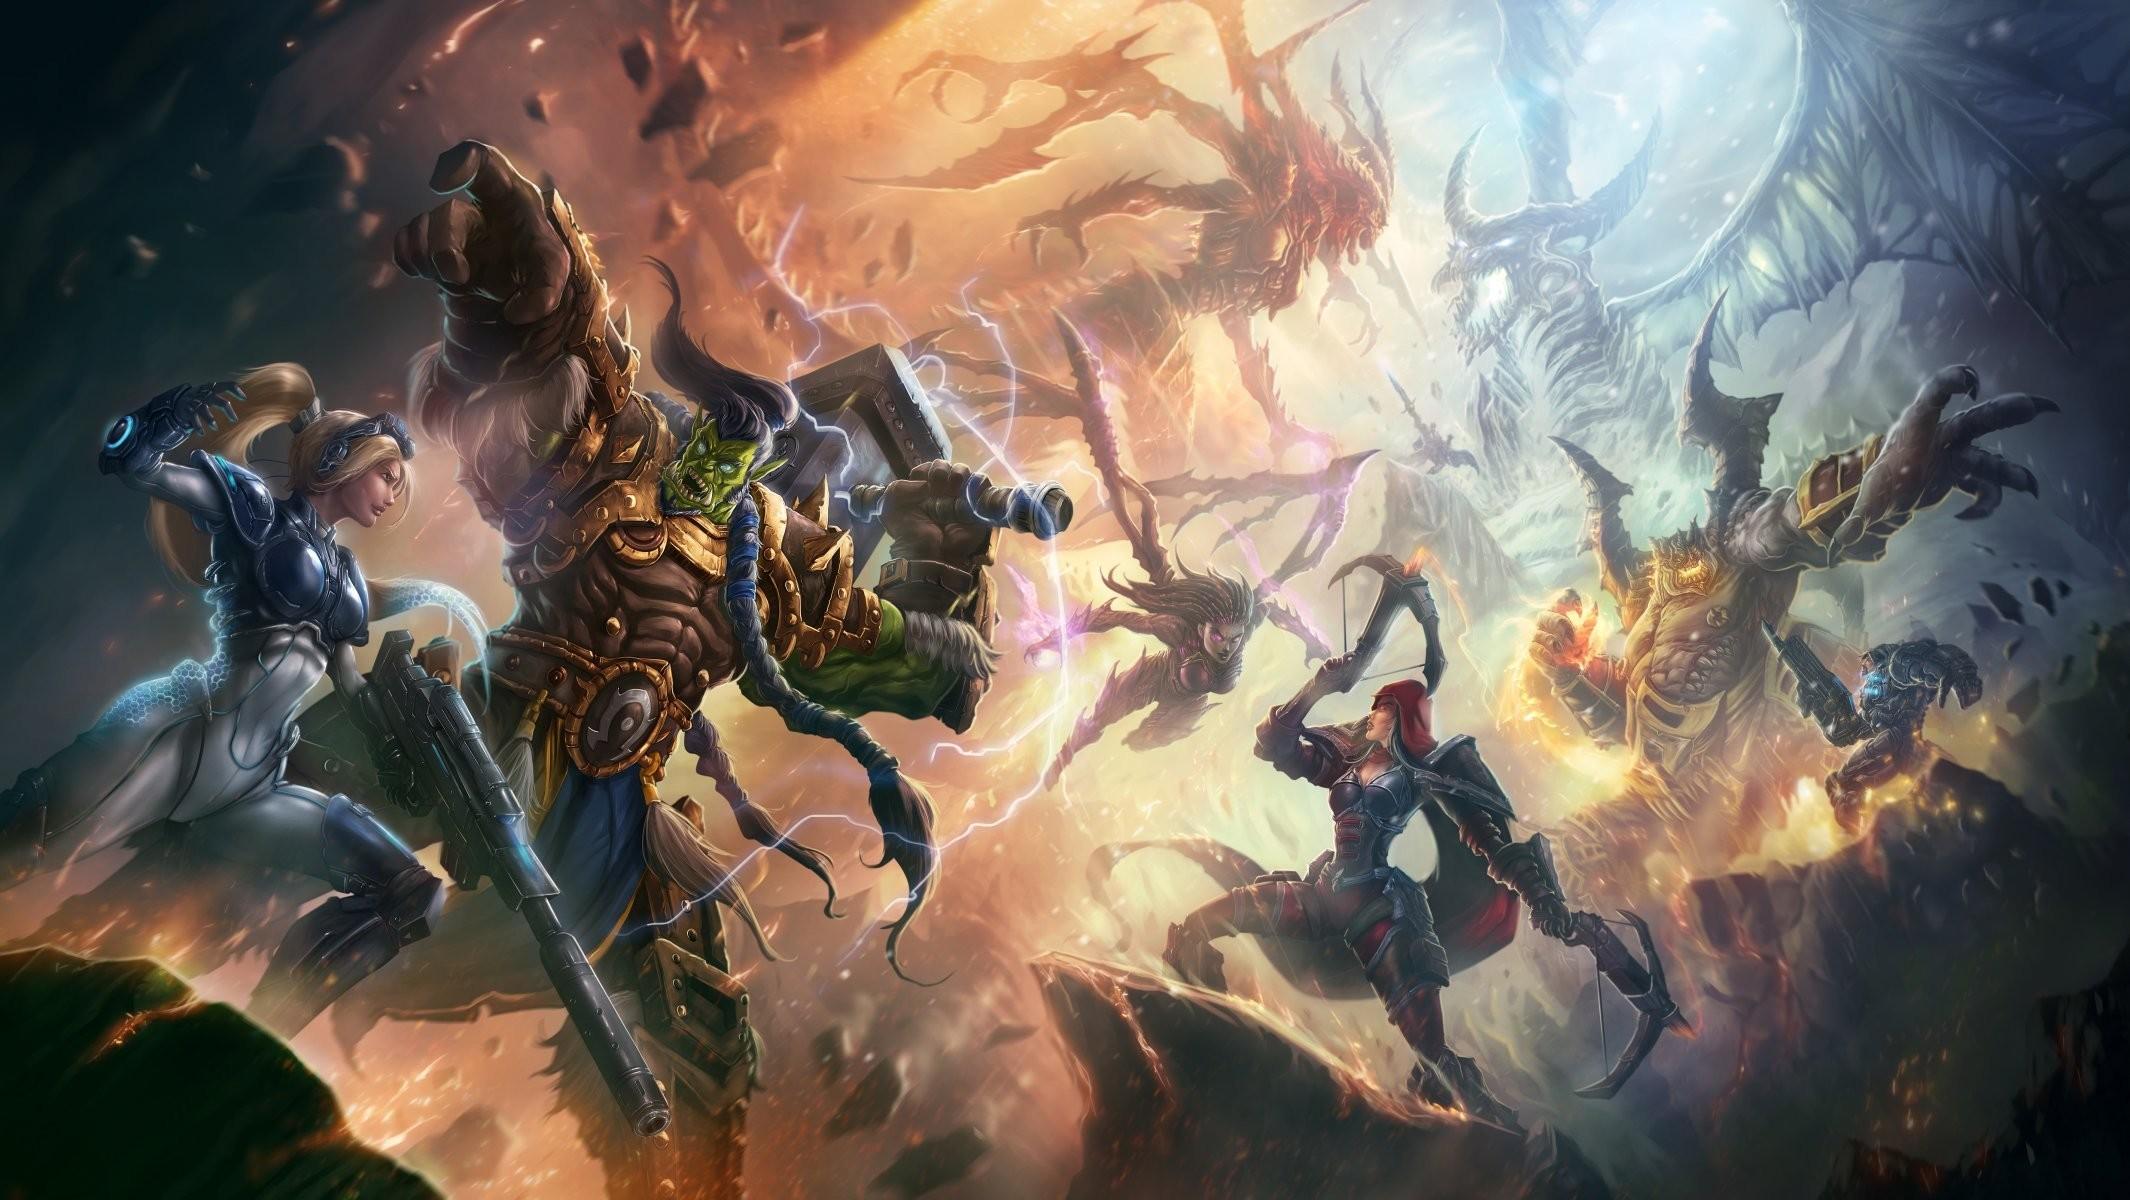 nova azmodan nova terra heroes of the storm starcraft thrall warcraft jim  raynor valla demon hunter